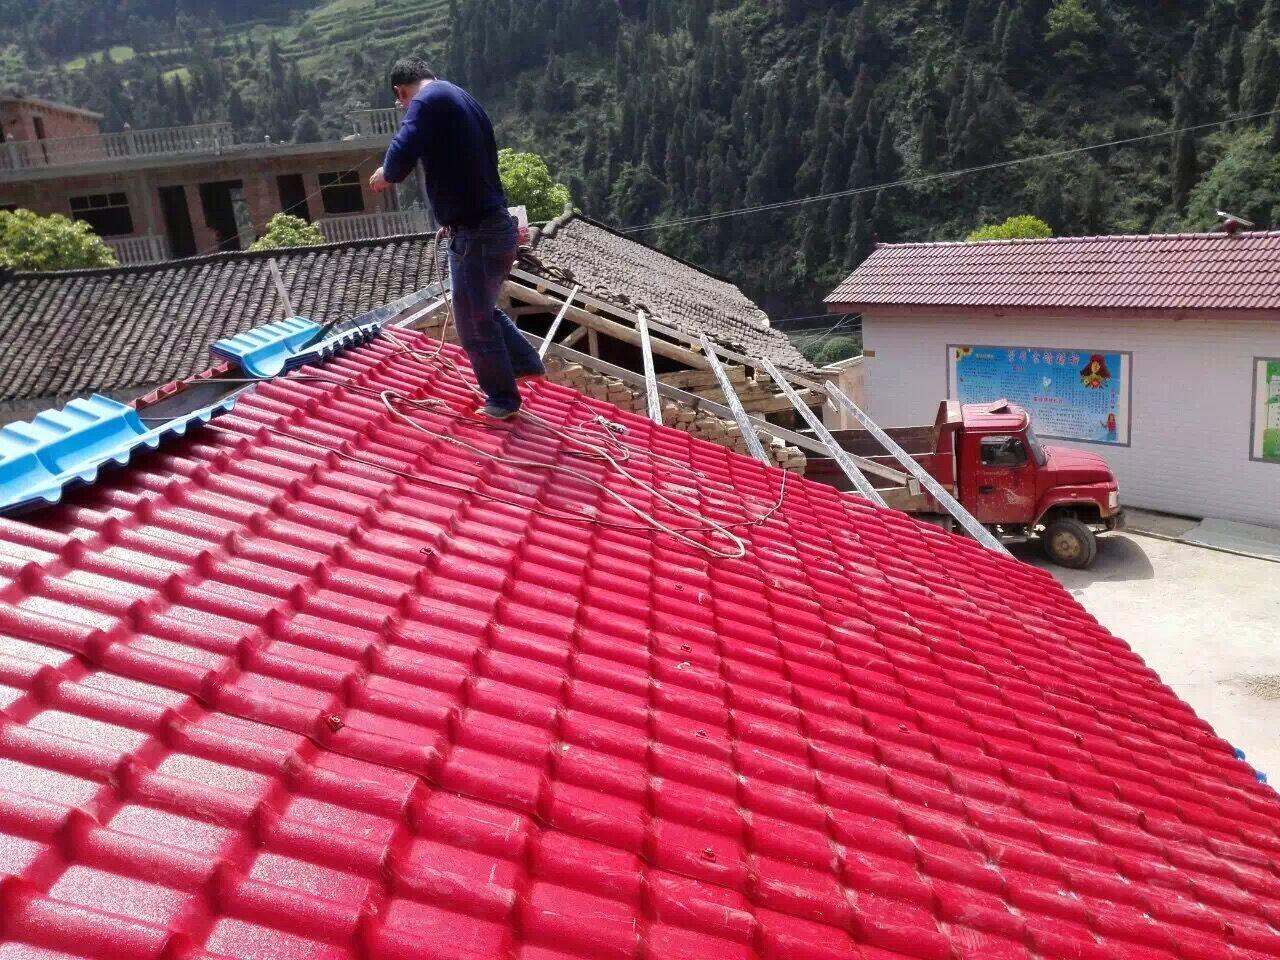 <b>贵州车河小学屋顶换瓦记-坤宝树脂瓦</b>